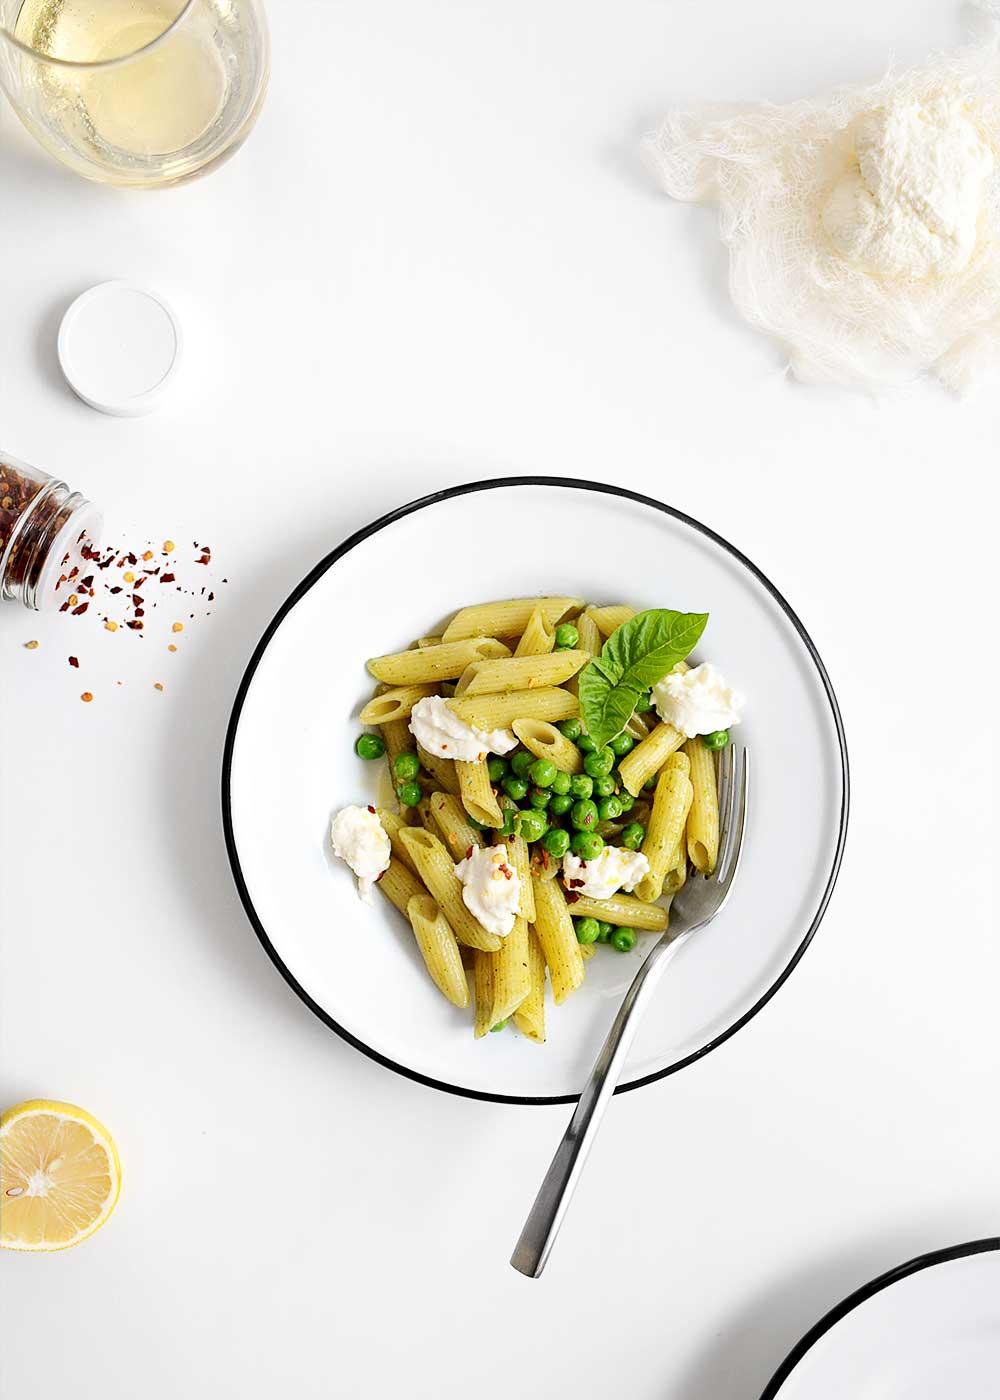 Homemade Ricotta on Pesto Pasta from The Fauxmartha